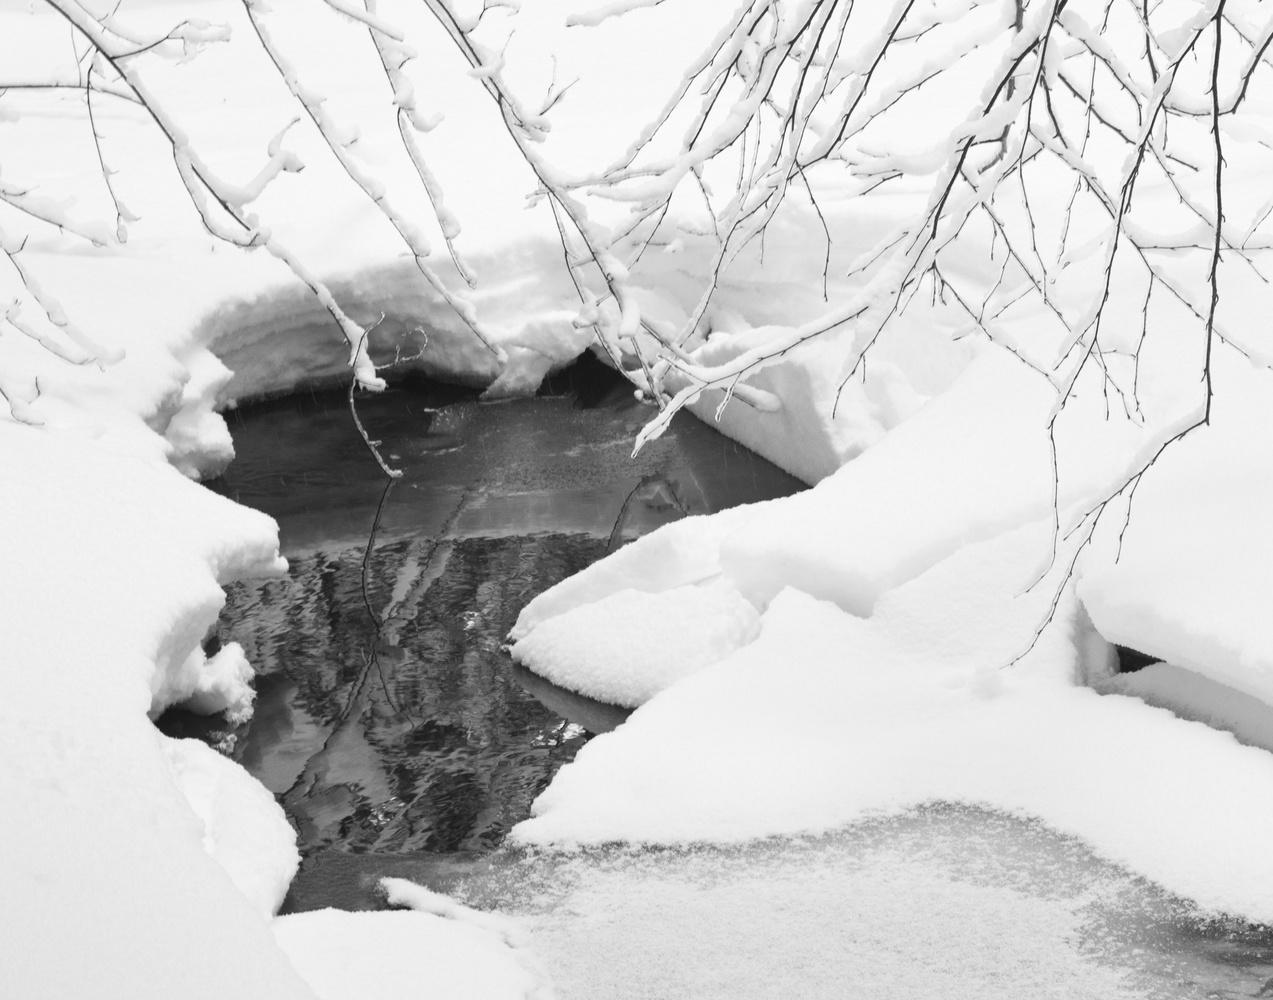 Winter Scene by James Jewers